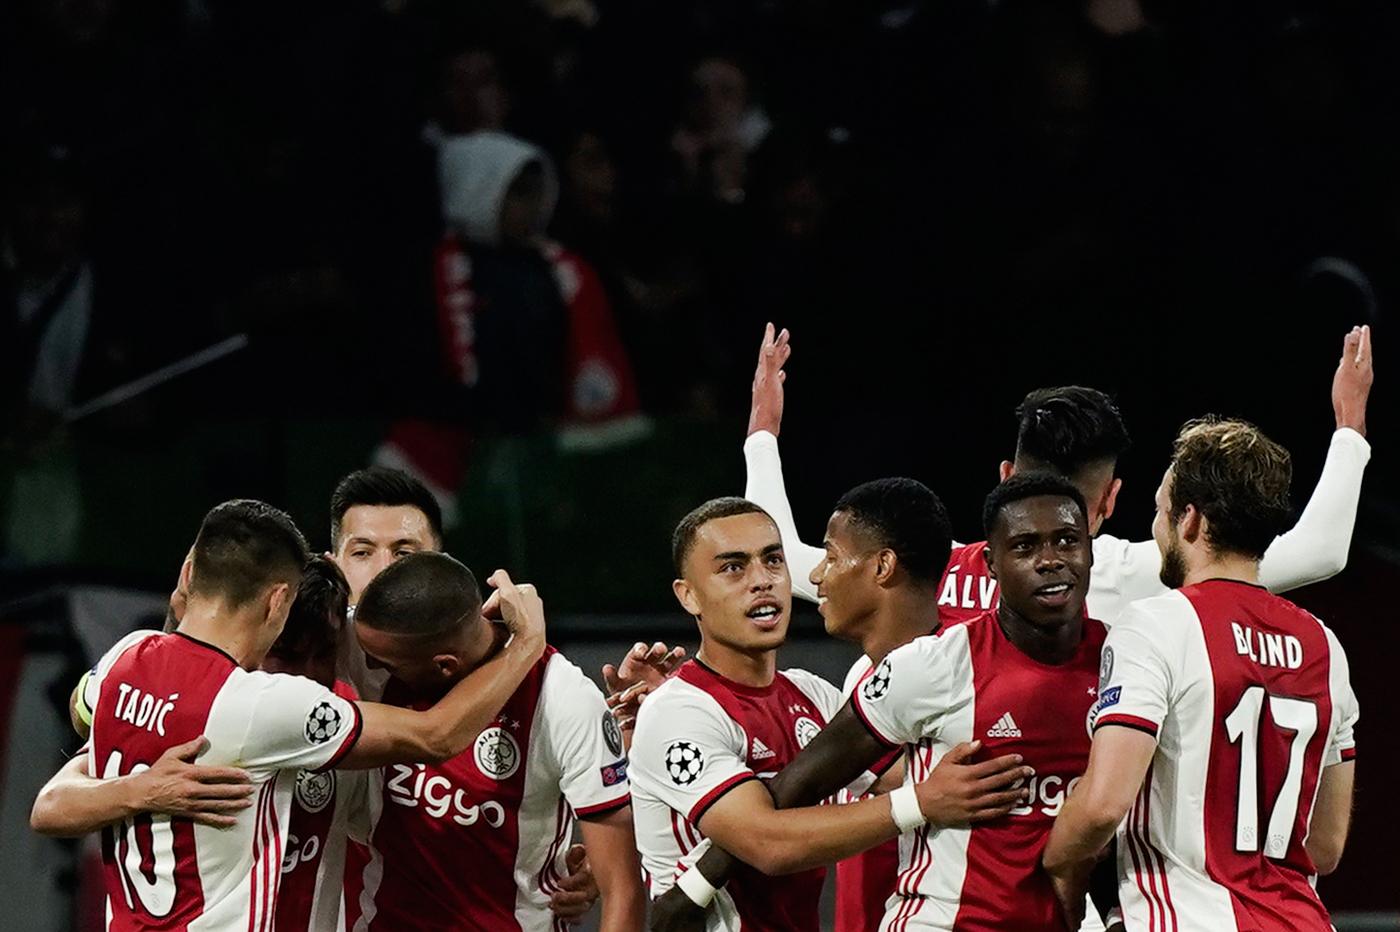 champions-league-ajax-valencia-pronostico-dicembre-2019